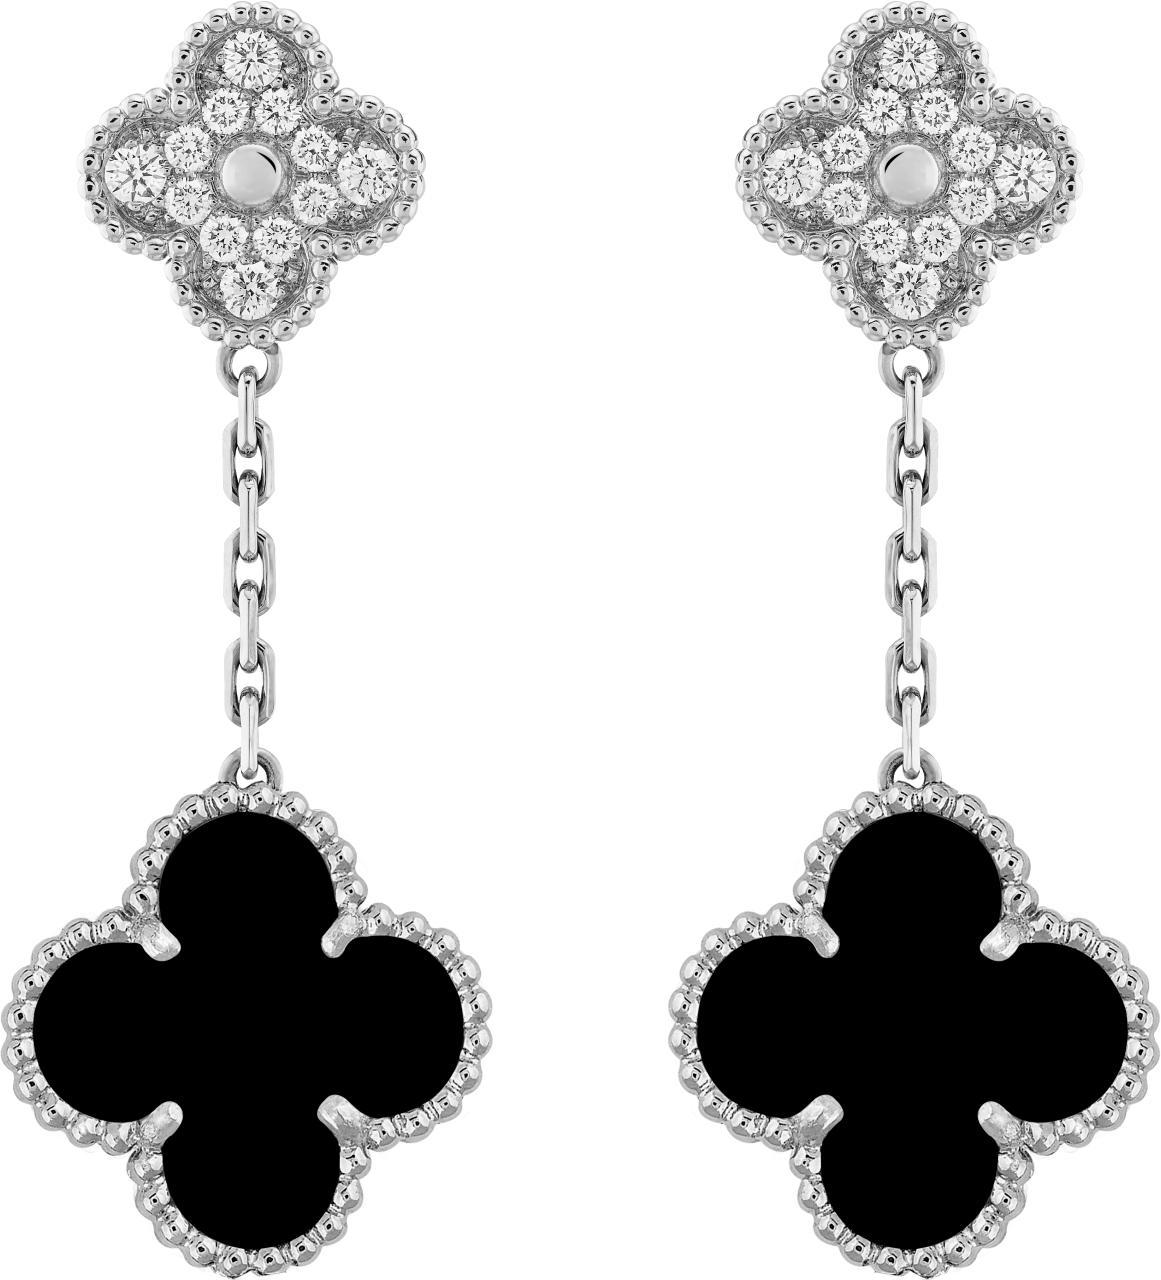 اجمل موديلات مجوهرات مرحة